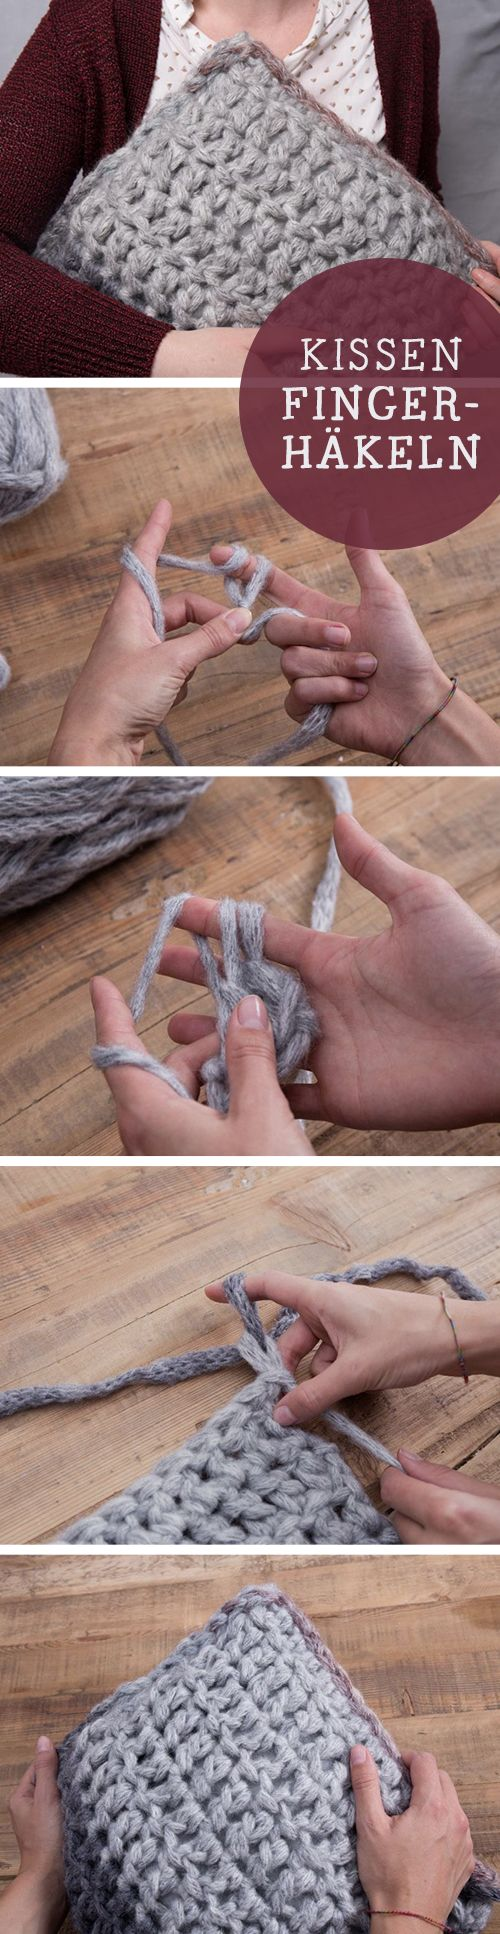 DIY-Anleitung: Alles über Fingerhäkeln, Kissen mit den Fingern häkeln / diy tutorial: how to crochet a cushion by hand via DaWanda.com